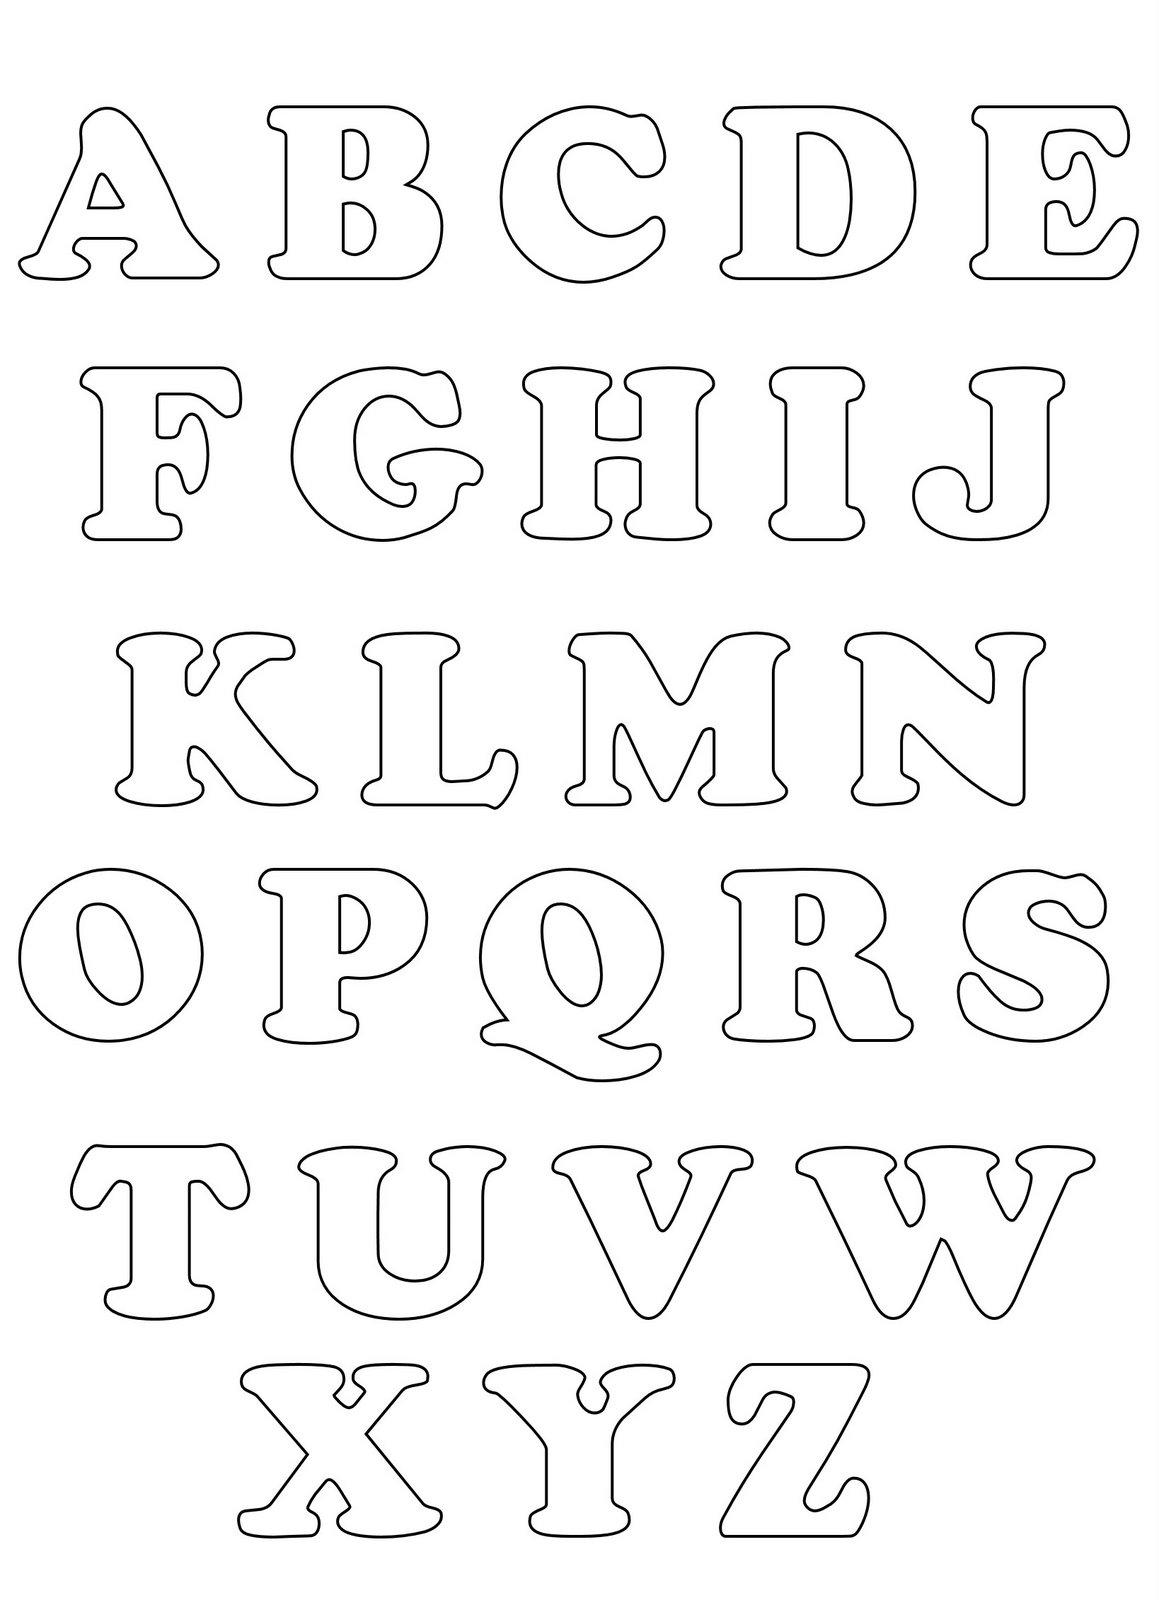 letra gotica gratis imprimir: